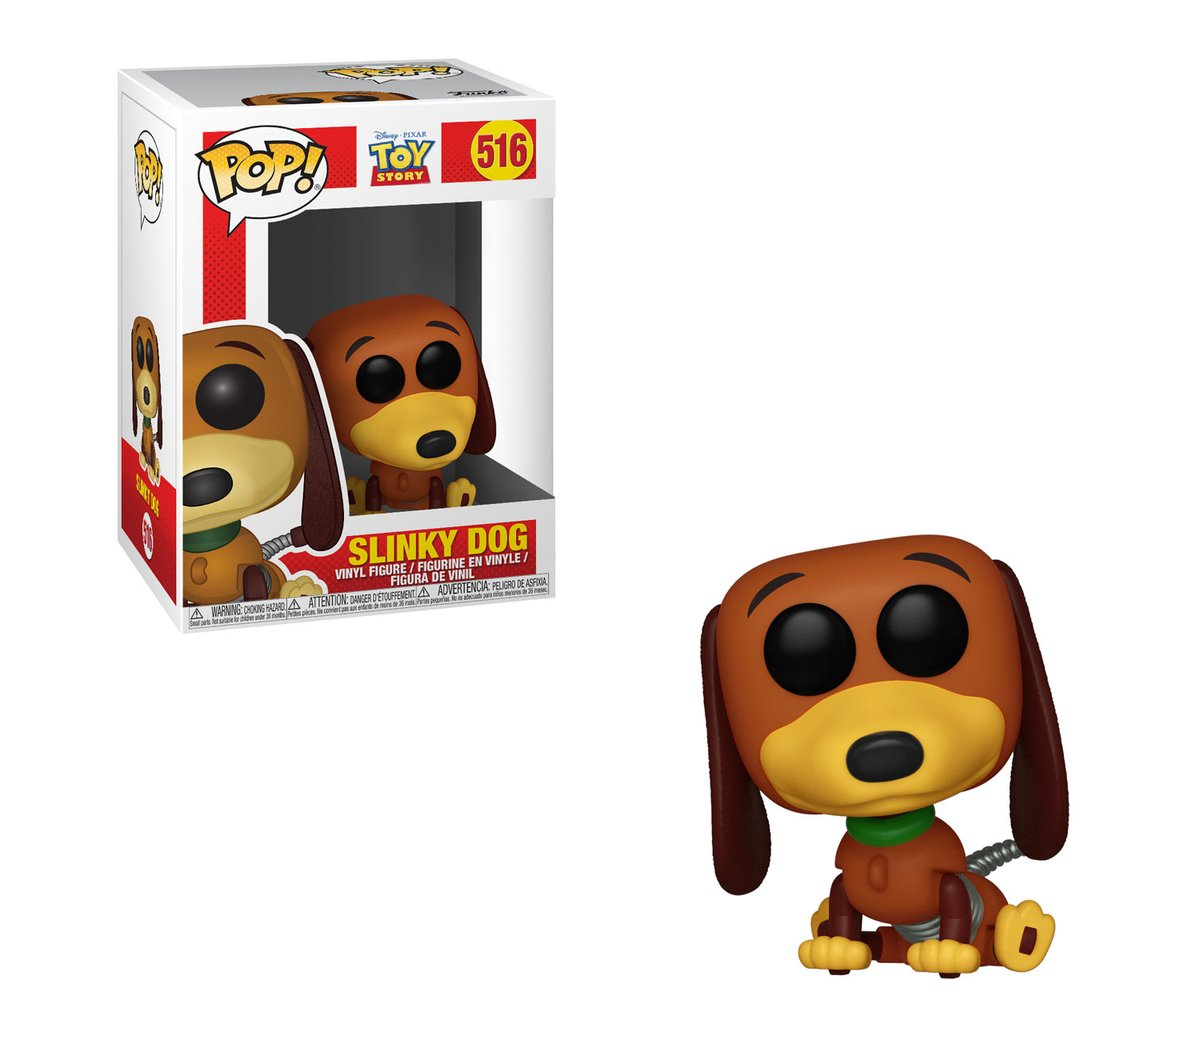 RT @OriginalFunko: RT & follow @OriginalFunko for a chance to WIN a 'Toy Story' Slinky Dog Pop! https://t.co/QNFFGqRngI